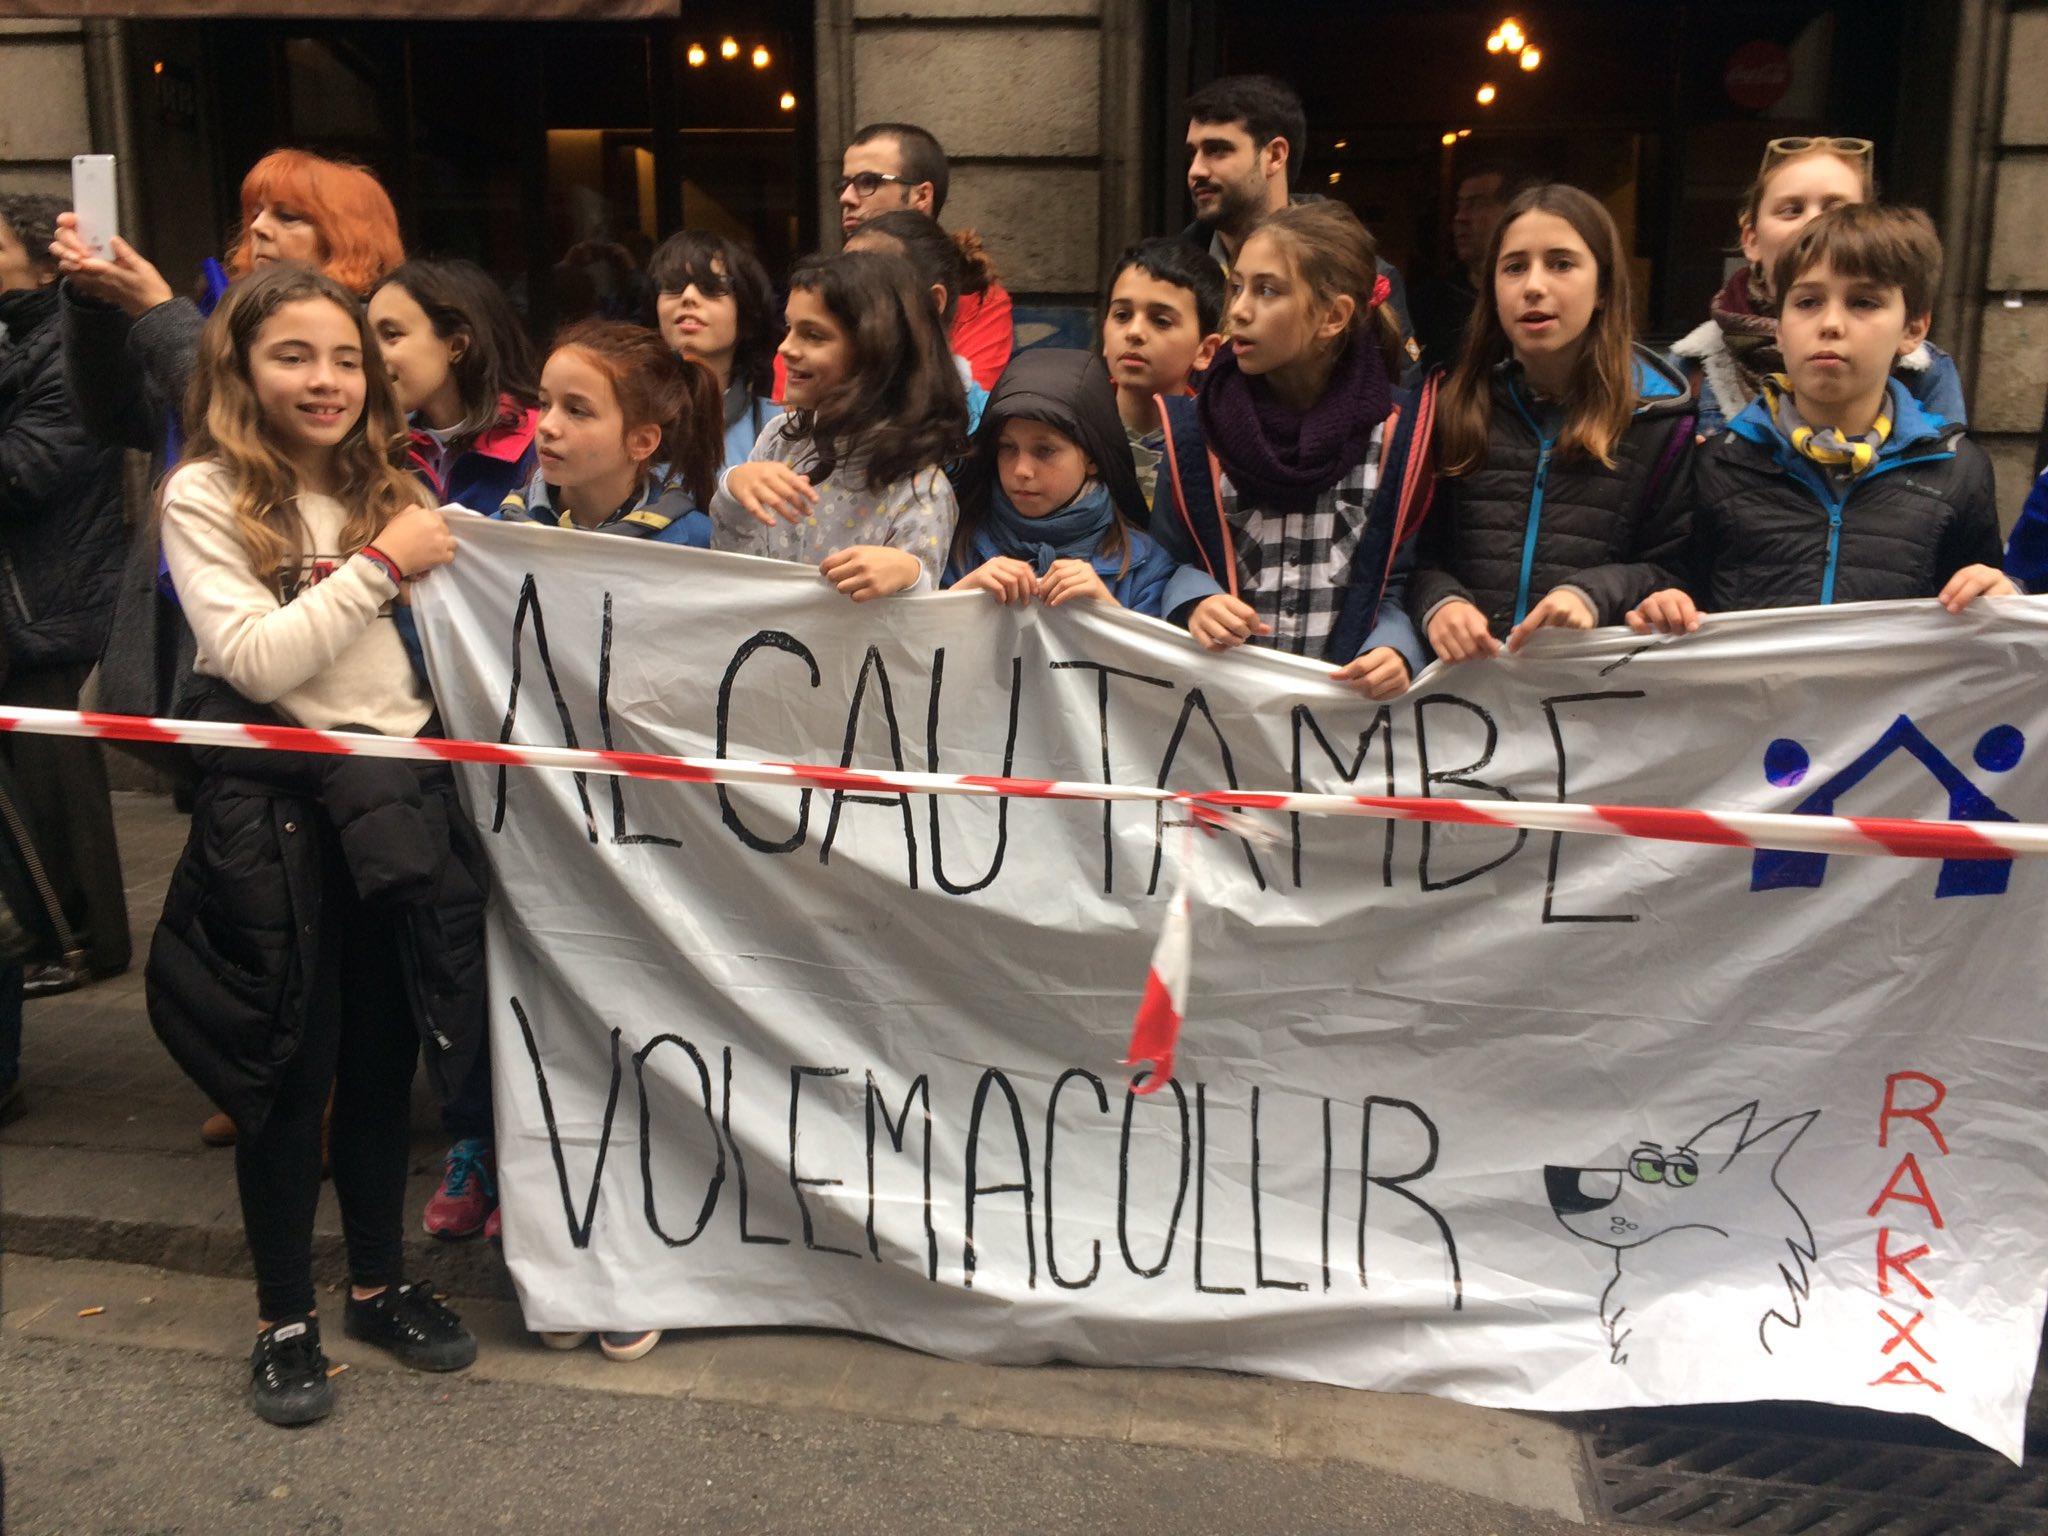 Manifestació Al Cau volem acollir (Rakxa)